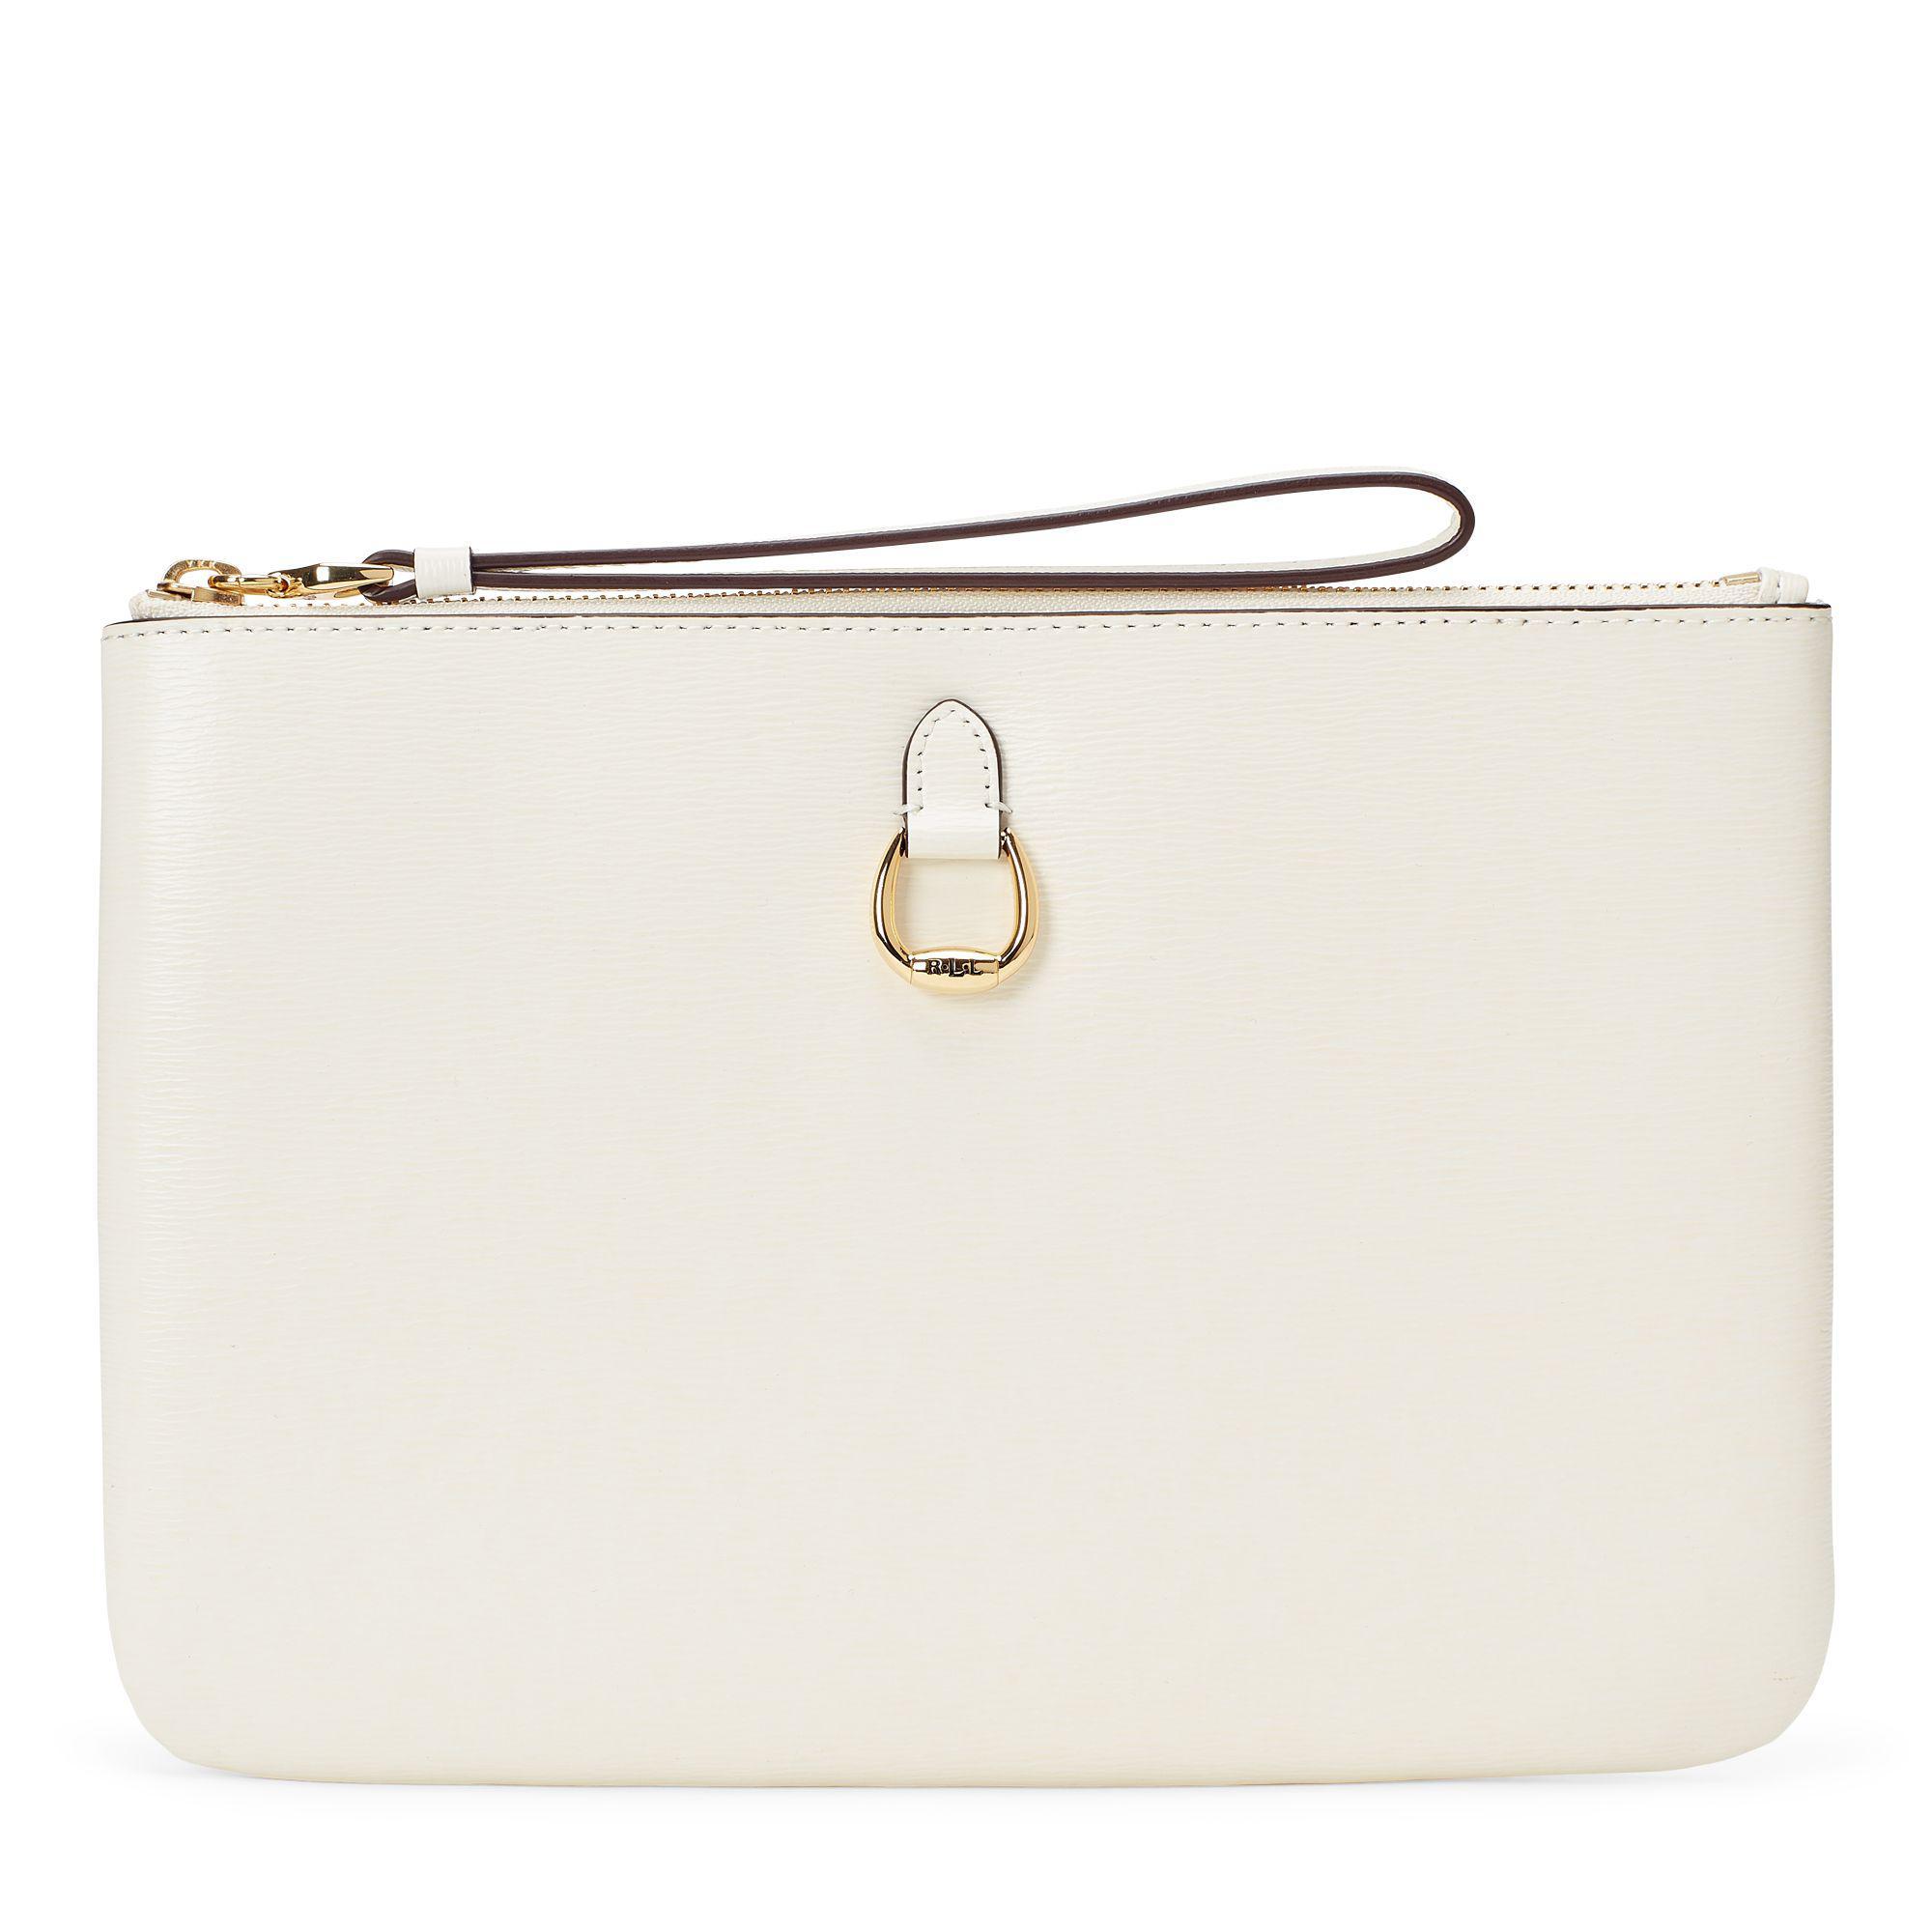 Ralph Lauren Saffiano Leather Wristlet in White - Lyst 6d1a82e74c0a2